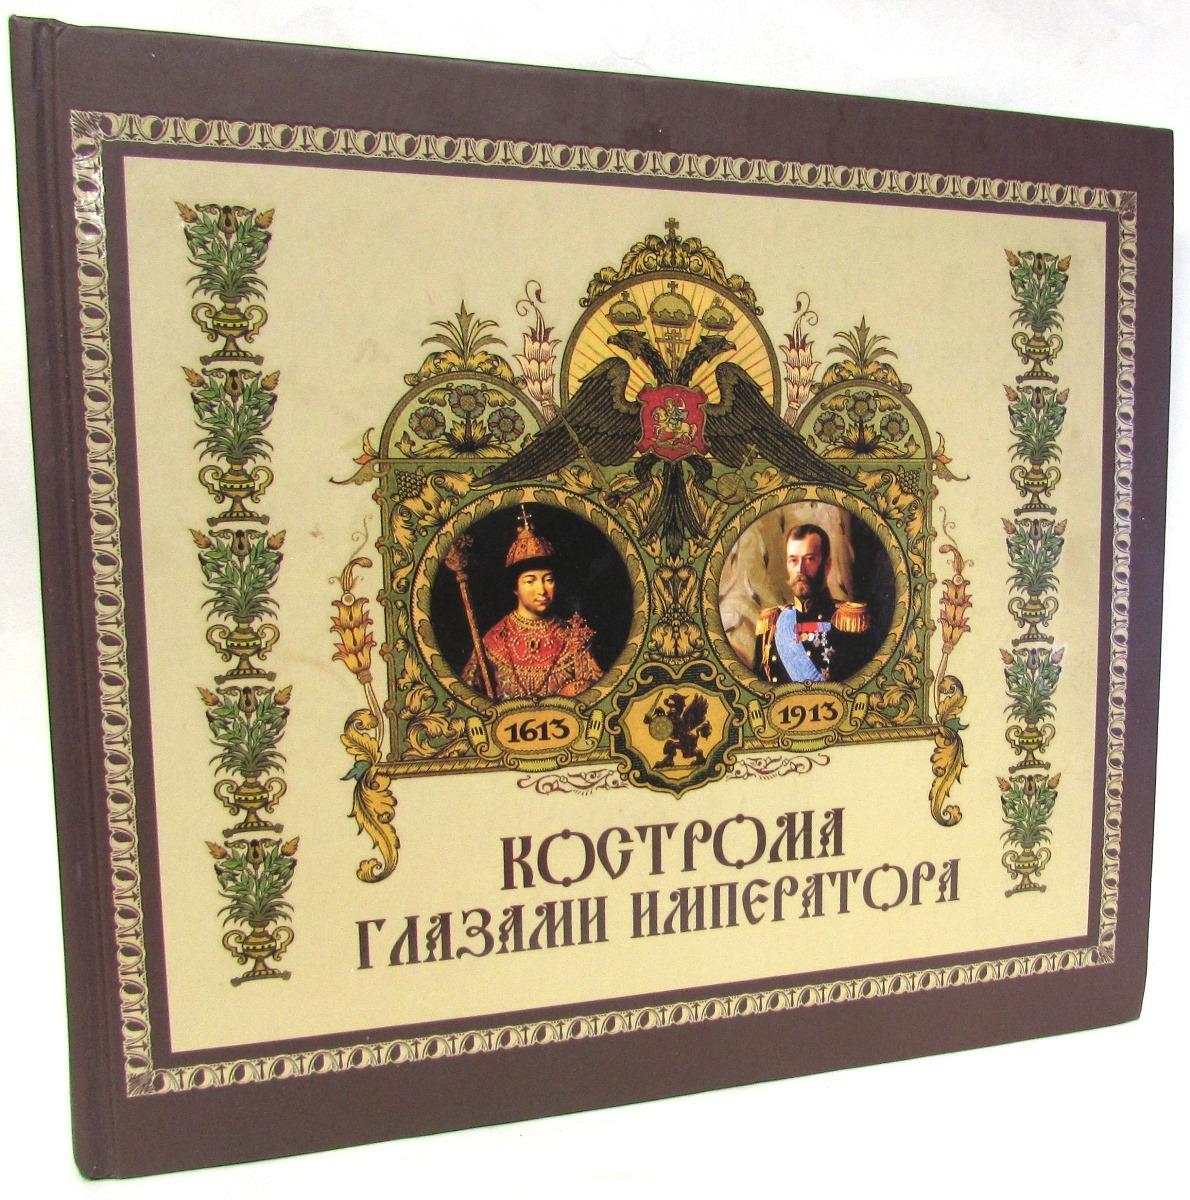 Дружнева Н.А. Кострома глазами императора